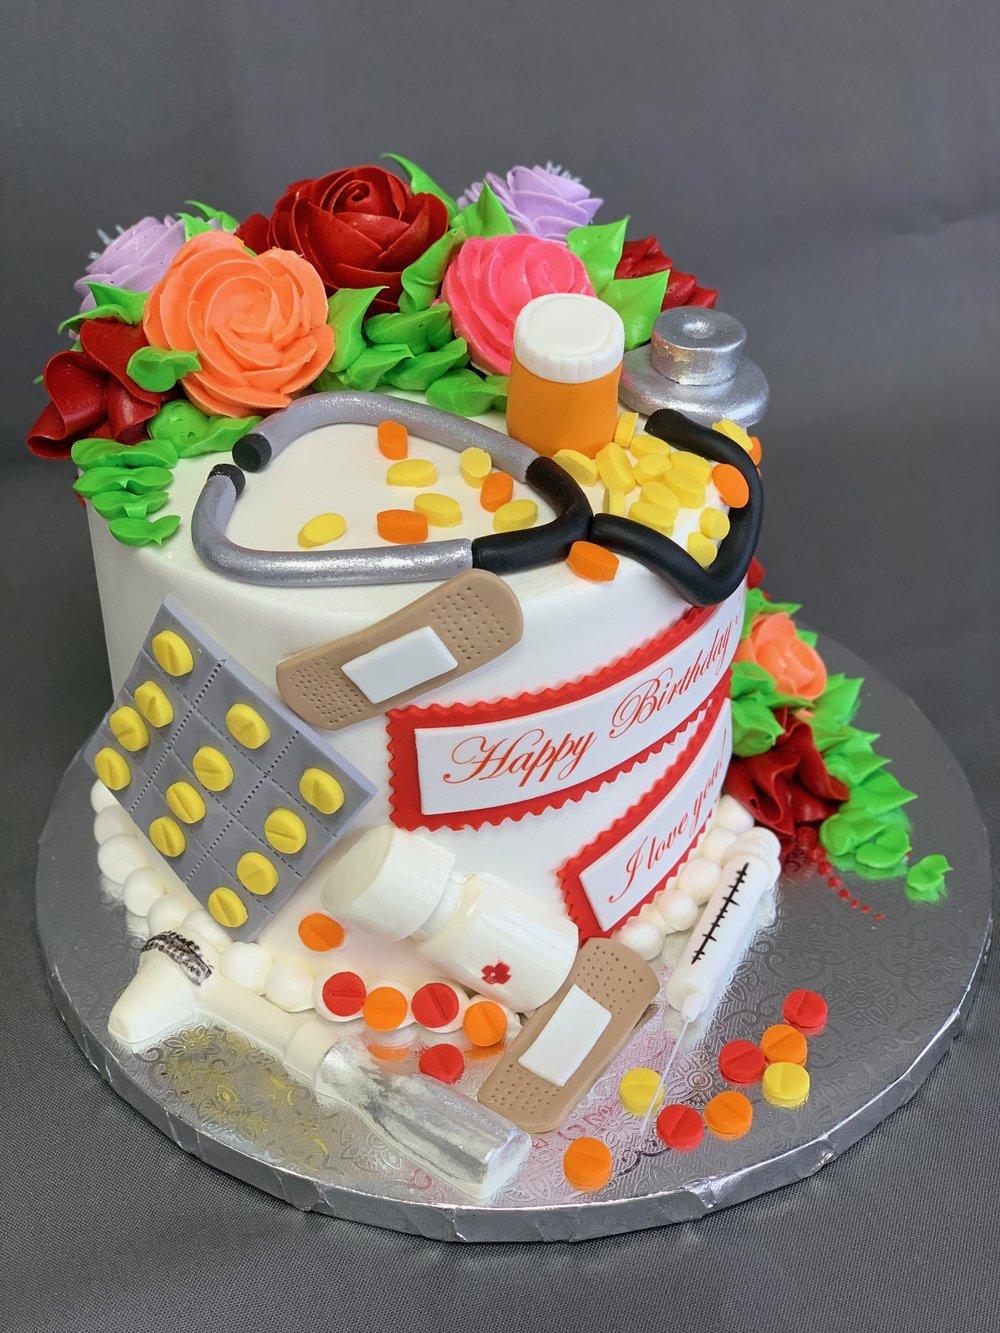 Best Birthday Cake New Jersey